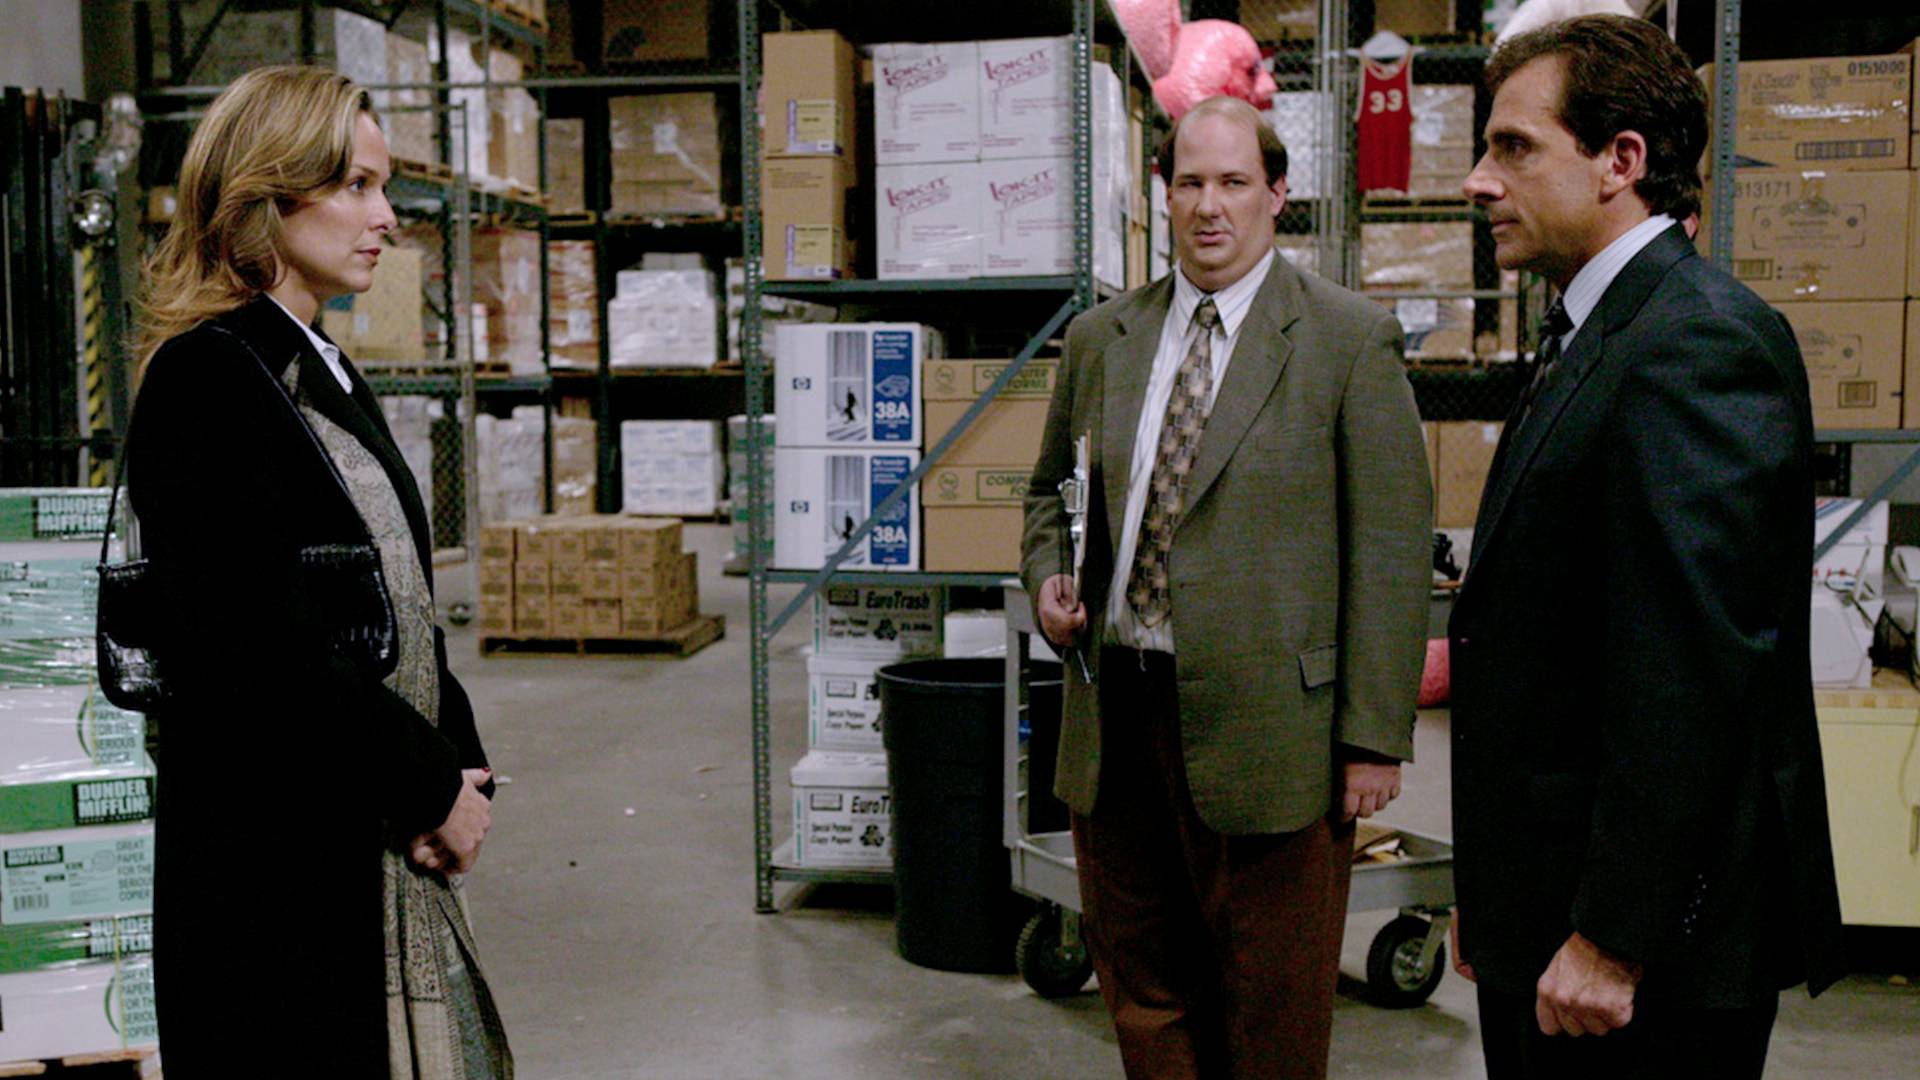 The Office Season 3 Episode 12